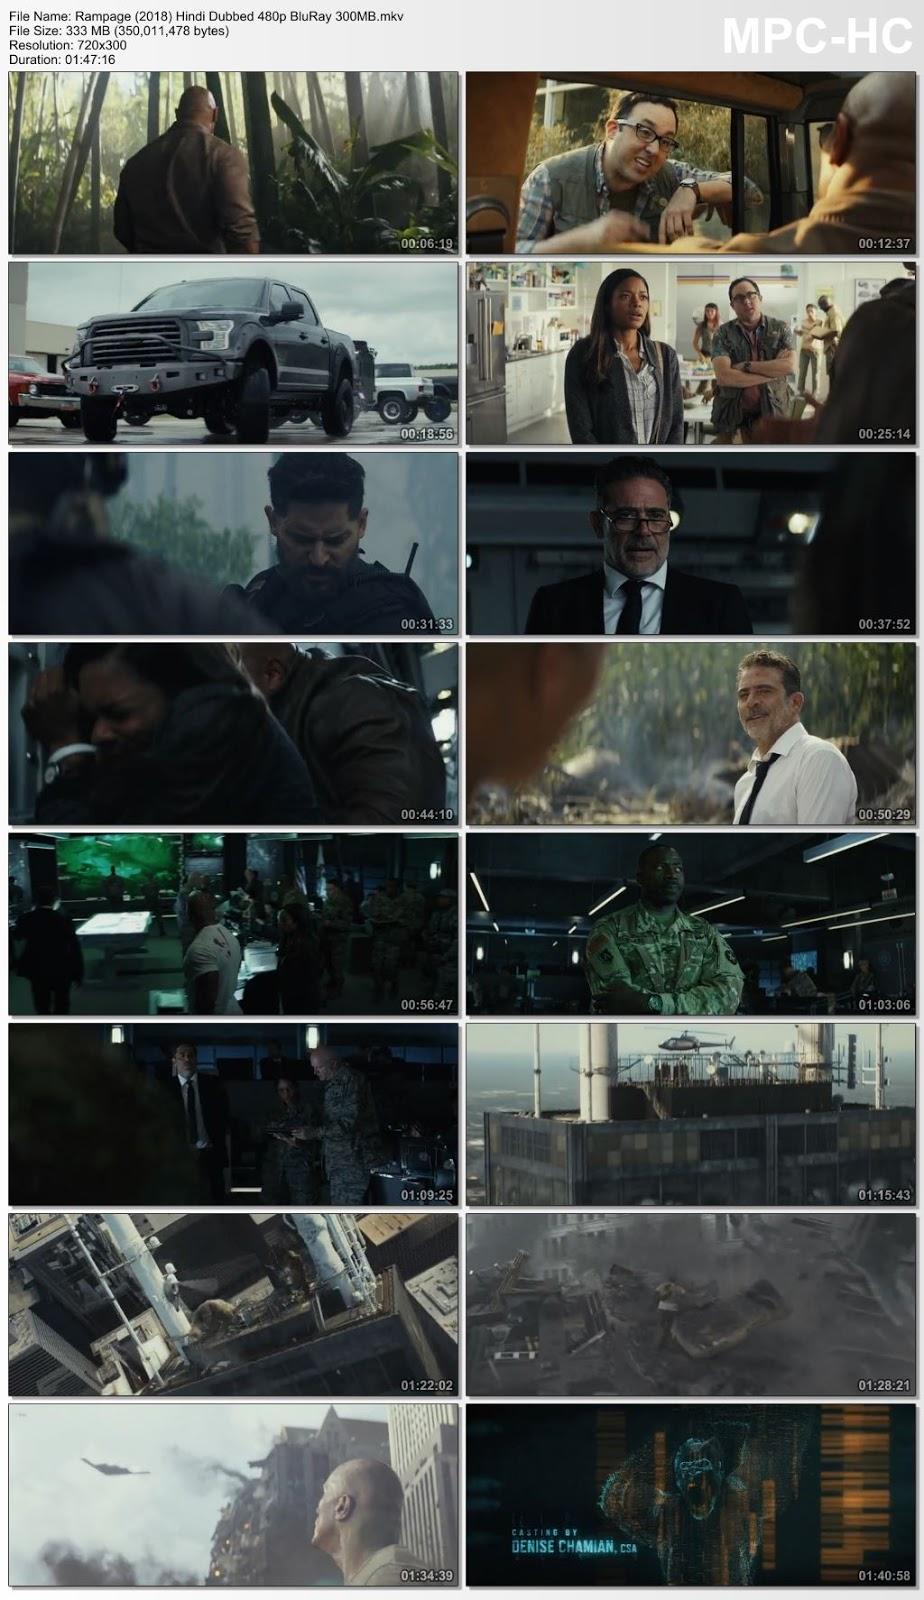 Rampage (2018) Hindi Dubbed 480p BluRay 300MB Desirehub